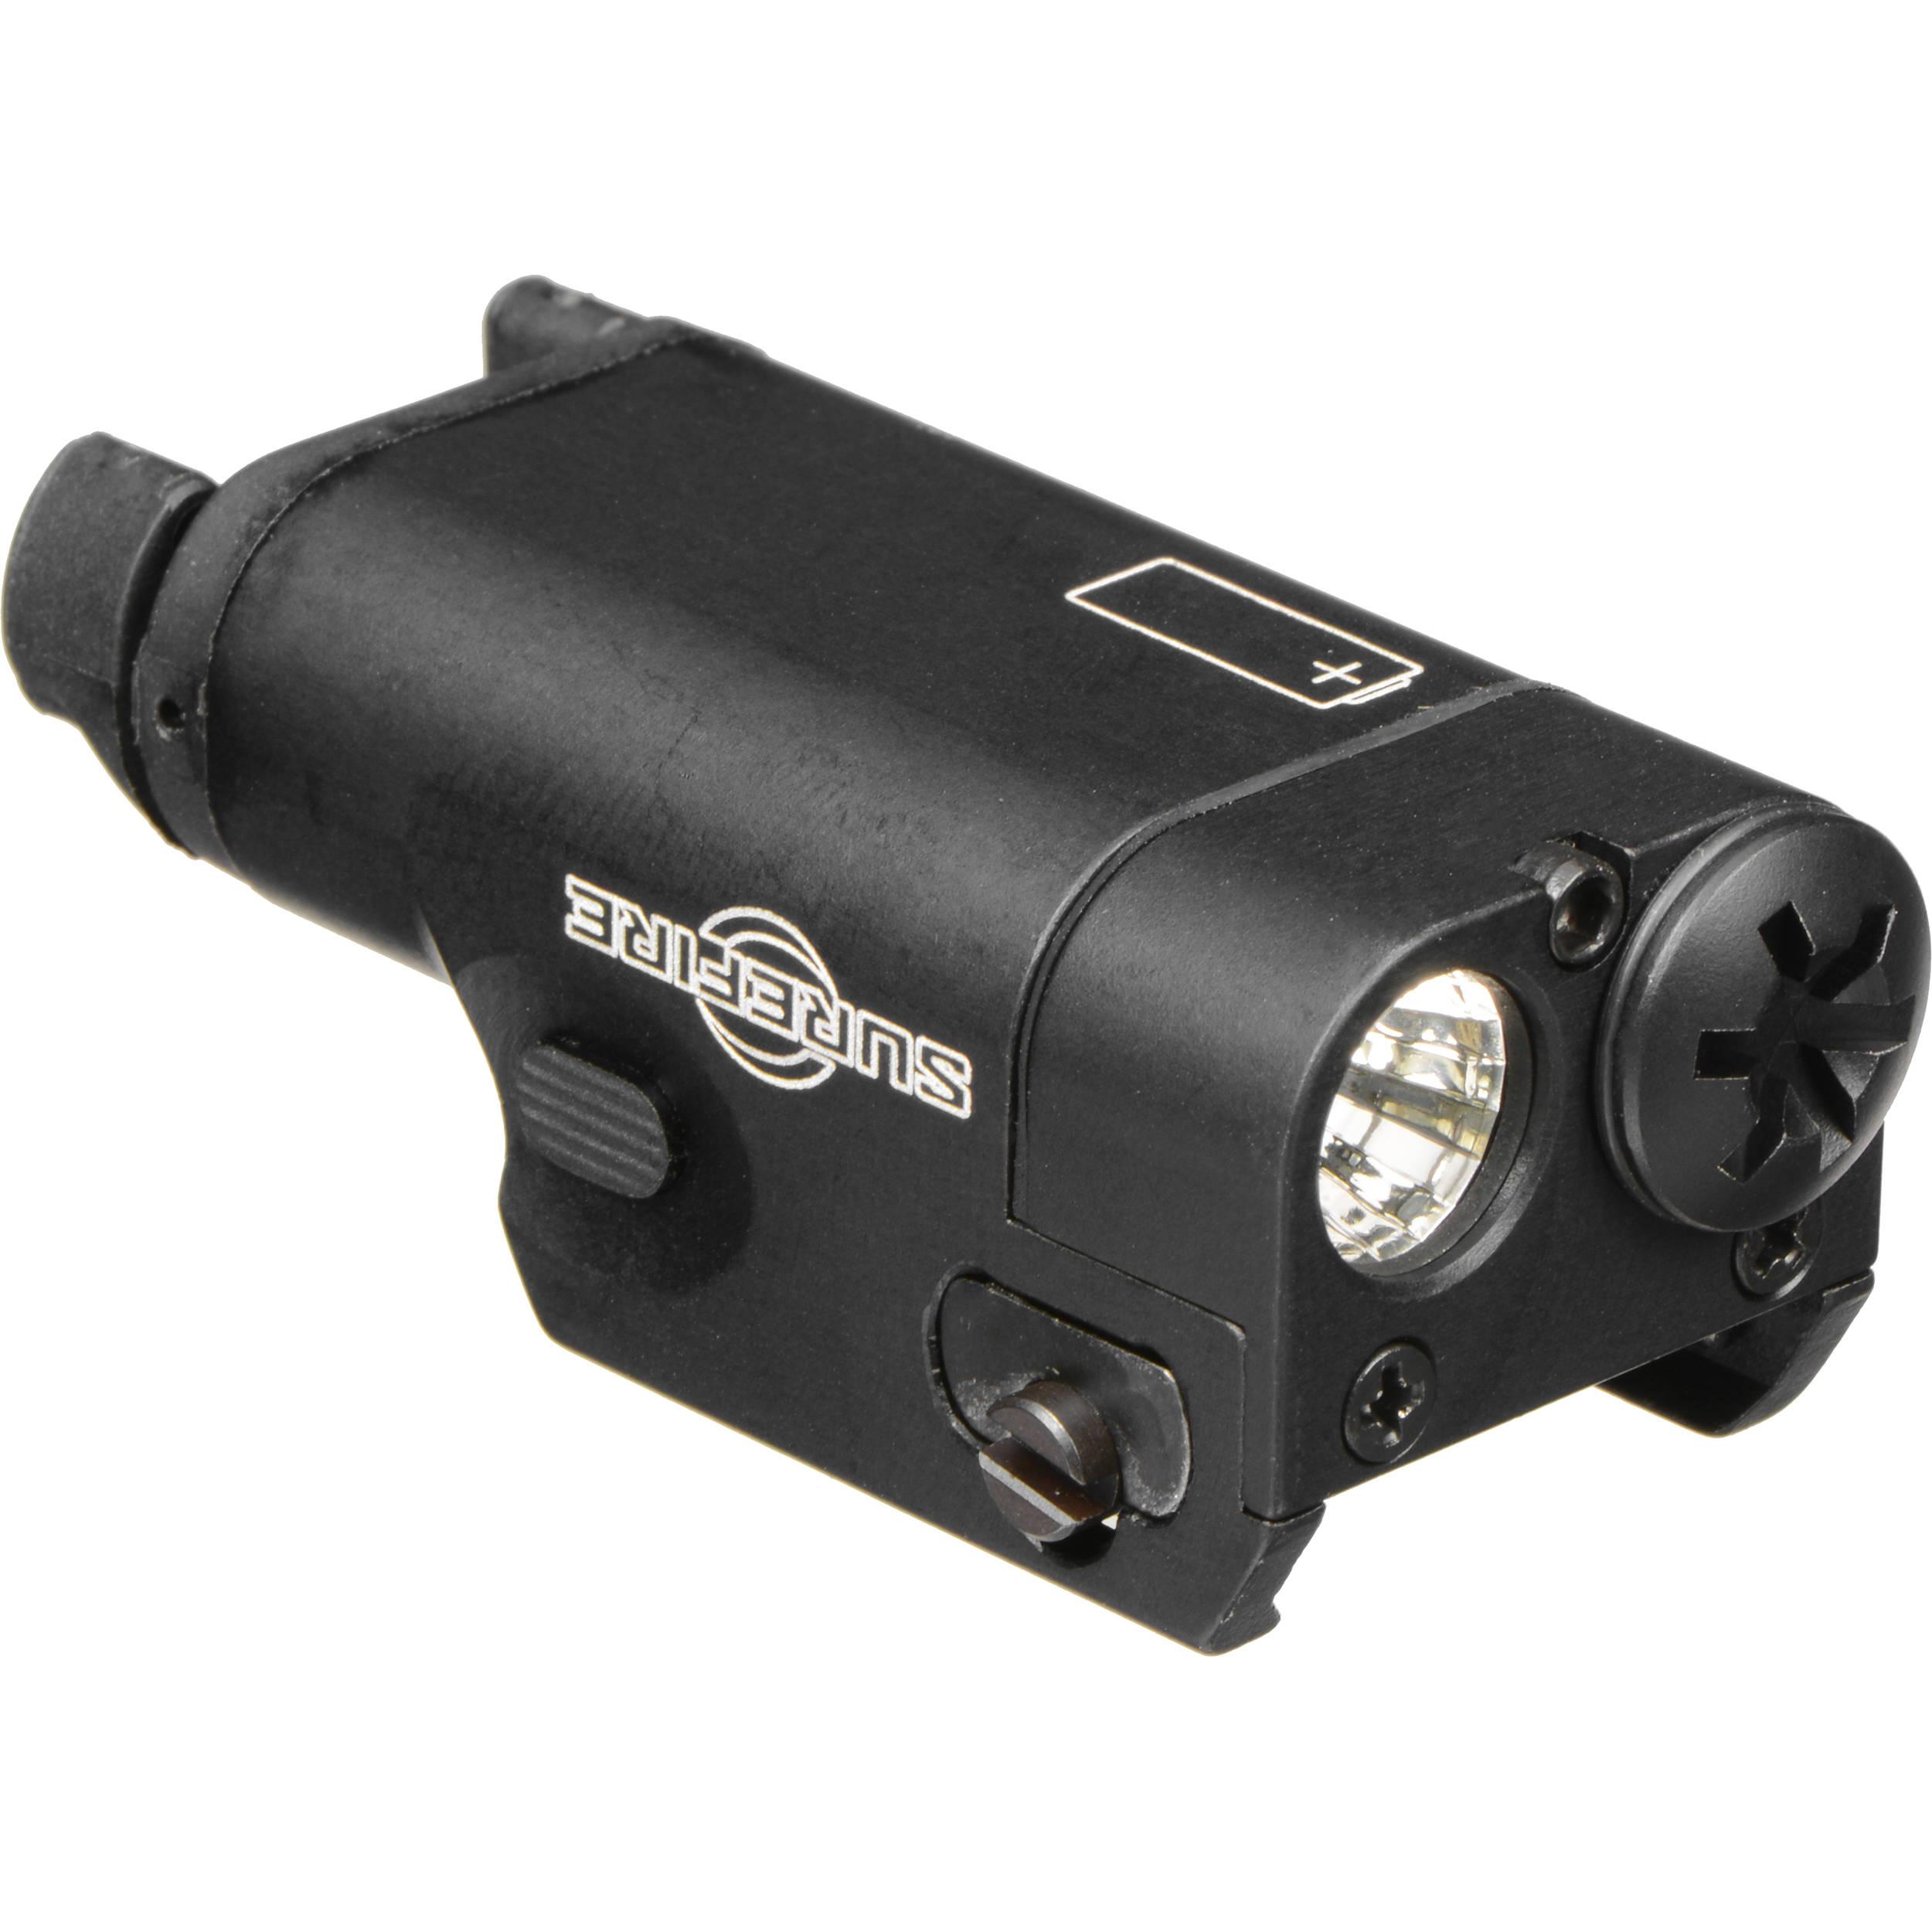 surefire xc1 ultra compact led handgun light black xc1 a b h. Black Bedroom Furniture Sets. Home Design Ideas